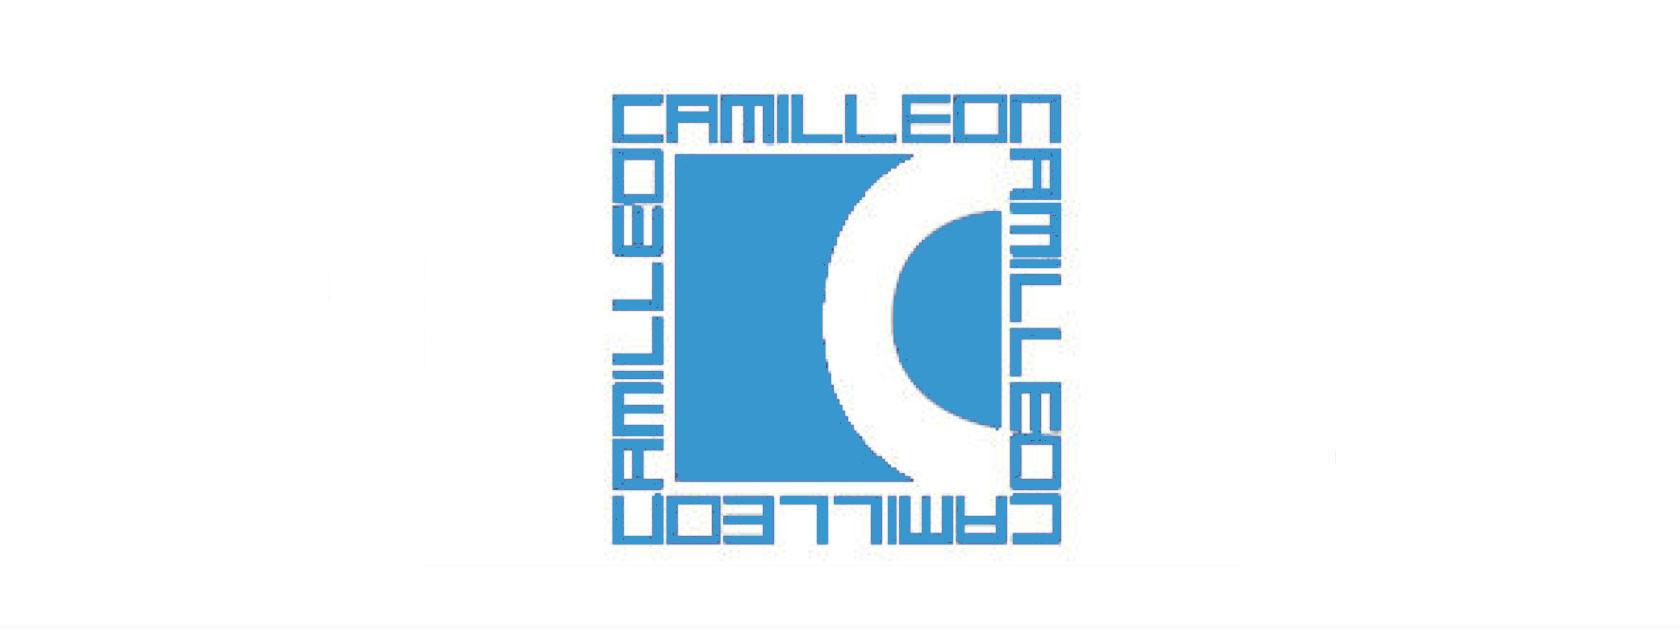 CAMilleon